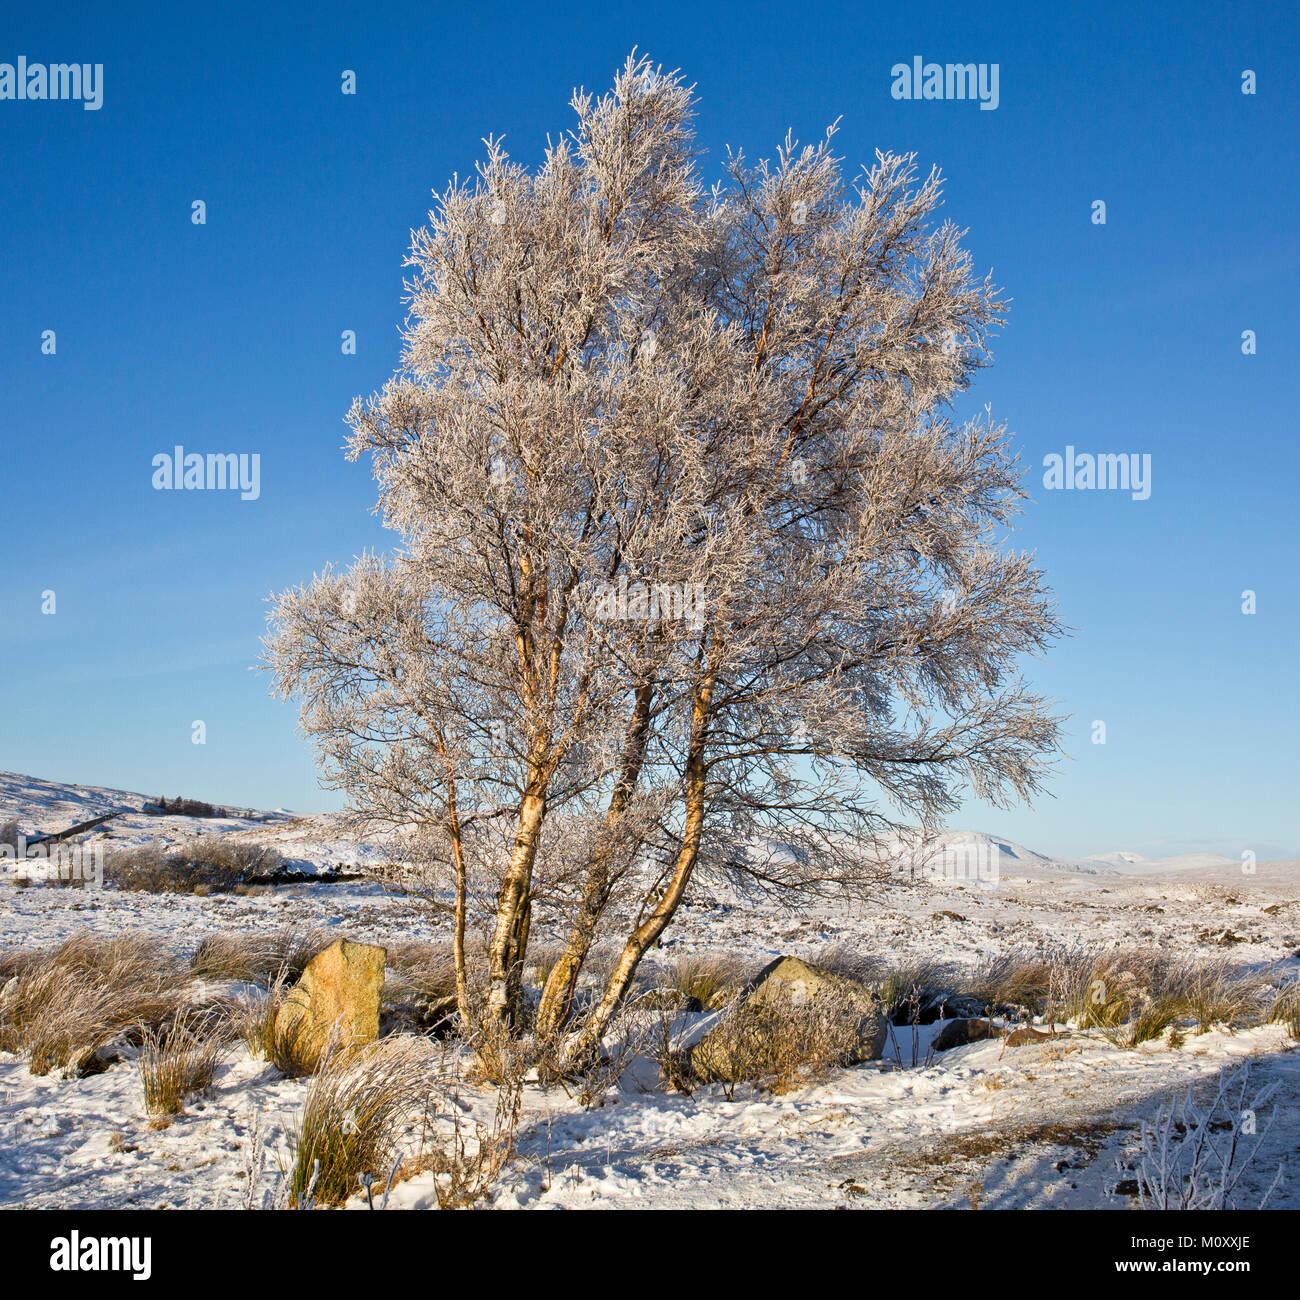 Rannoch Moor, Scotland, frozen birch tree in winter - Stock Image